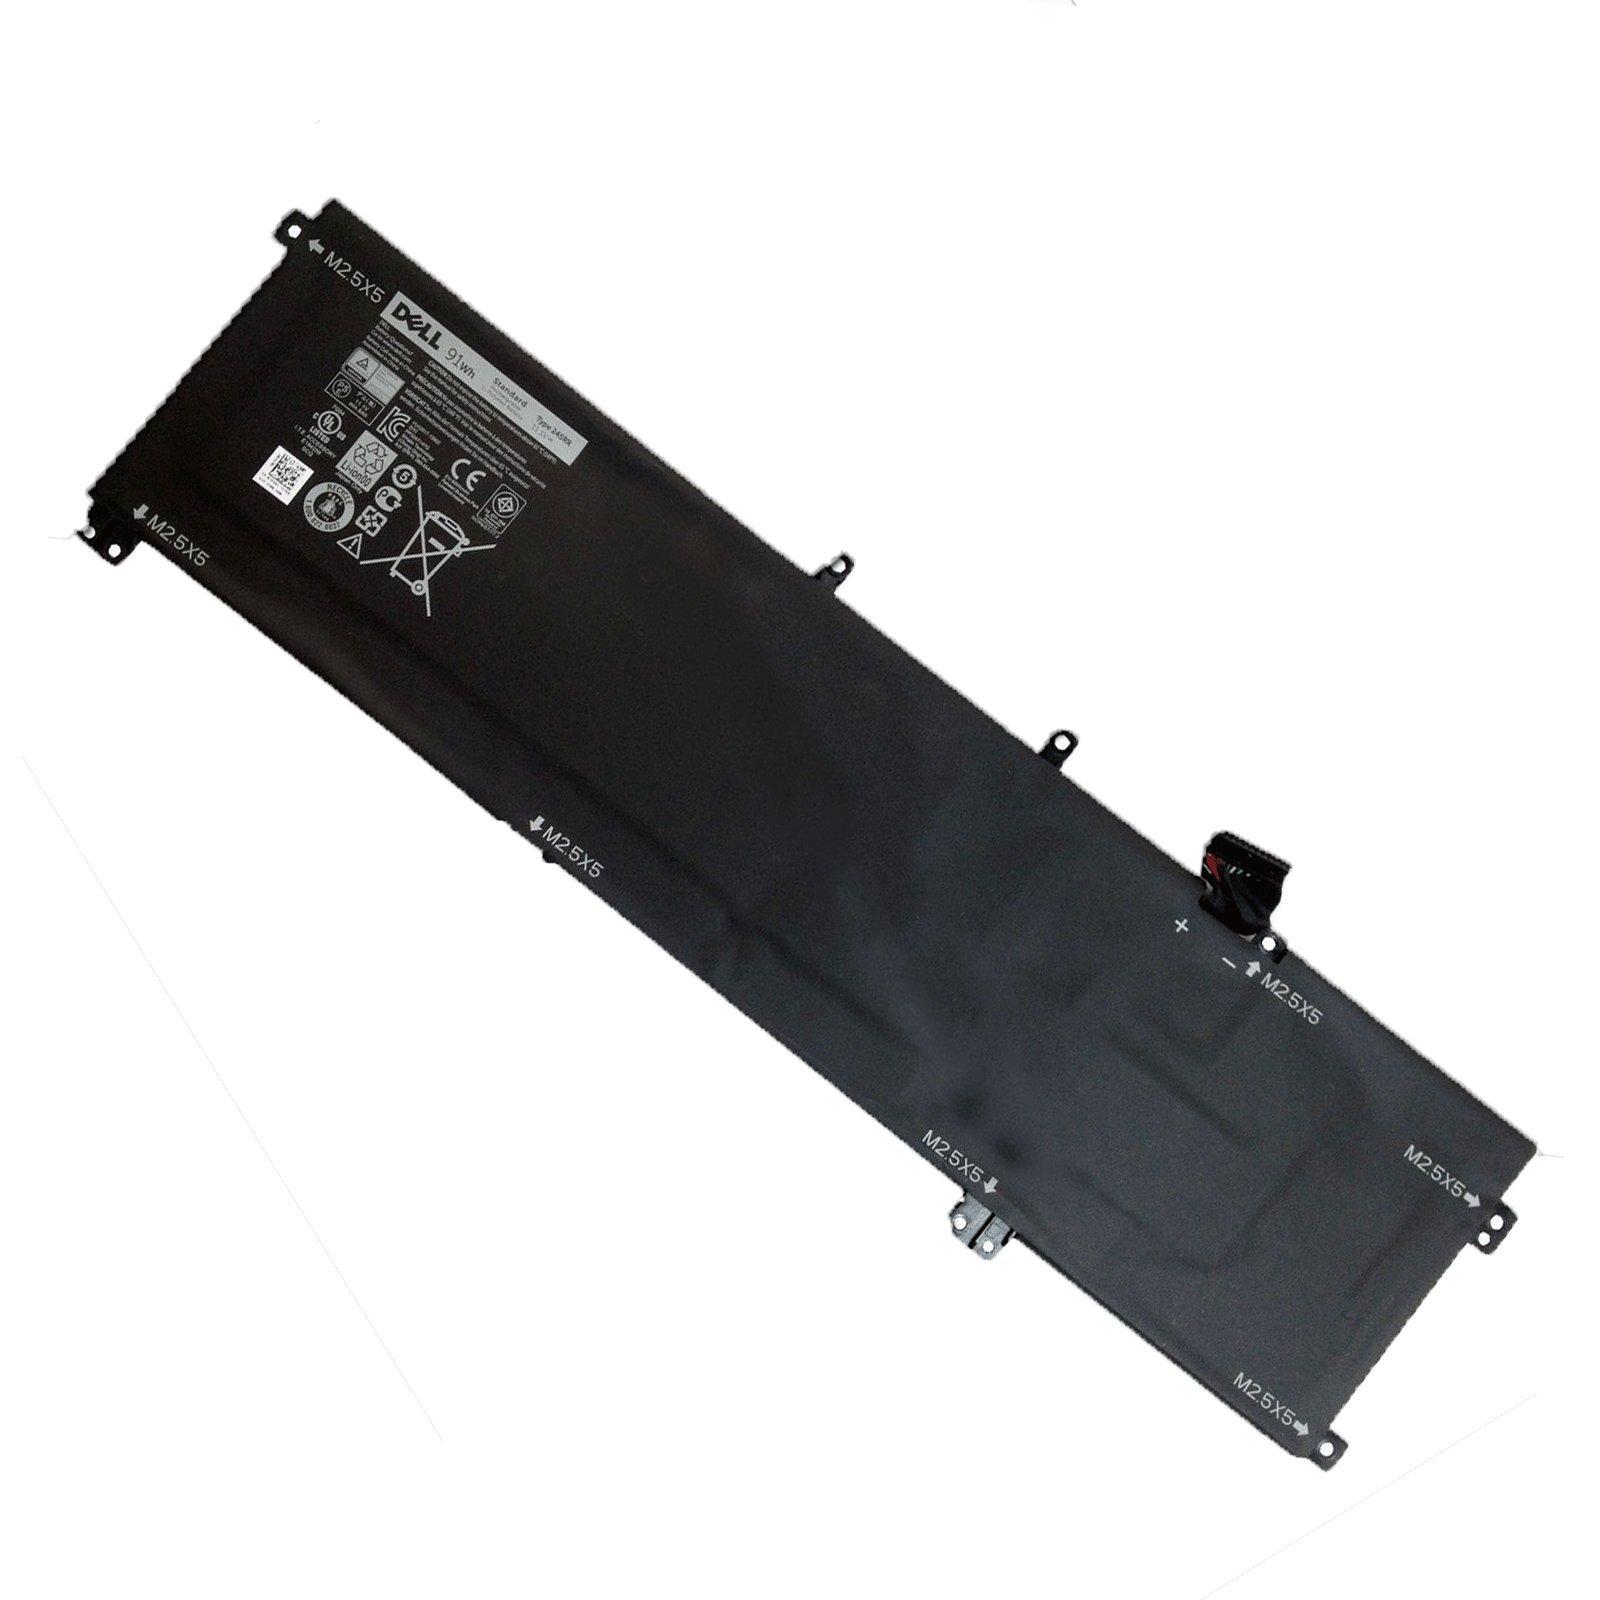 ORIGINAL Dell XPS 15 9530 Precision M3800 Laptop Battery 701WJ 245RR(11.1V 91Wh) by Dell Original